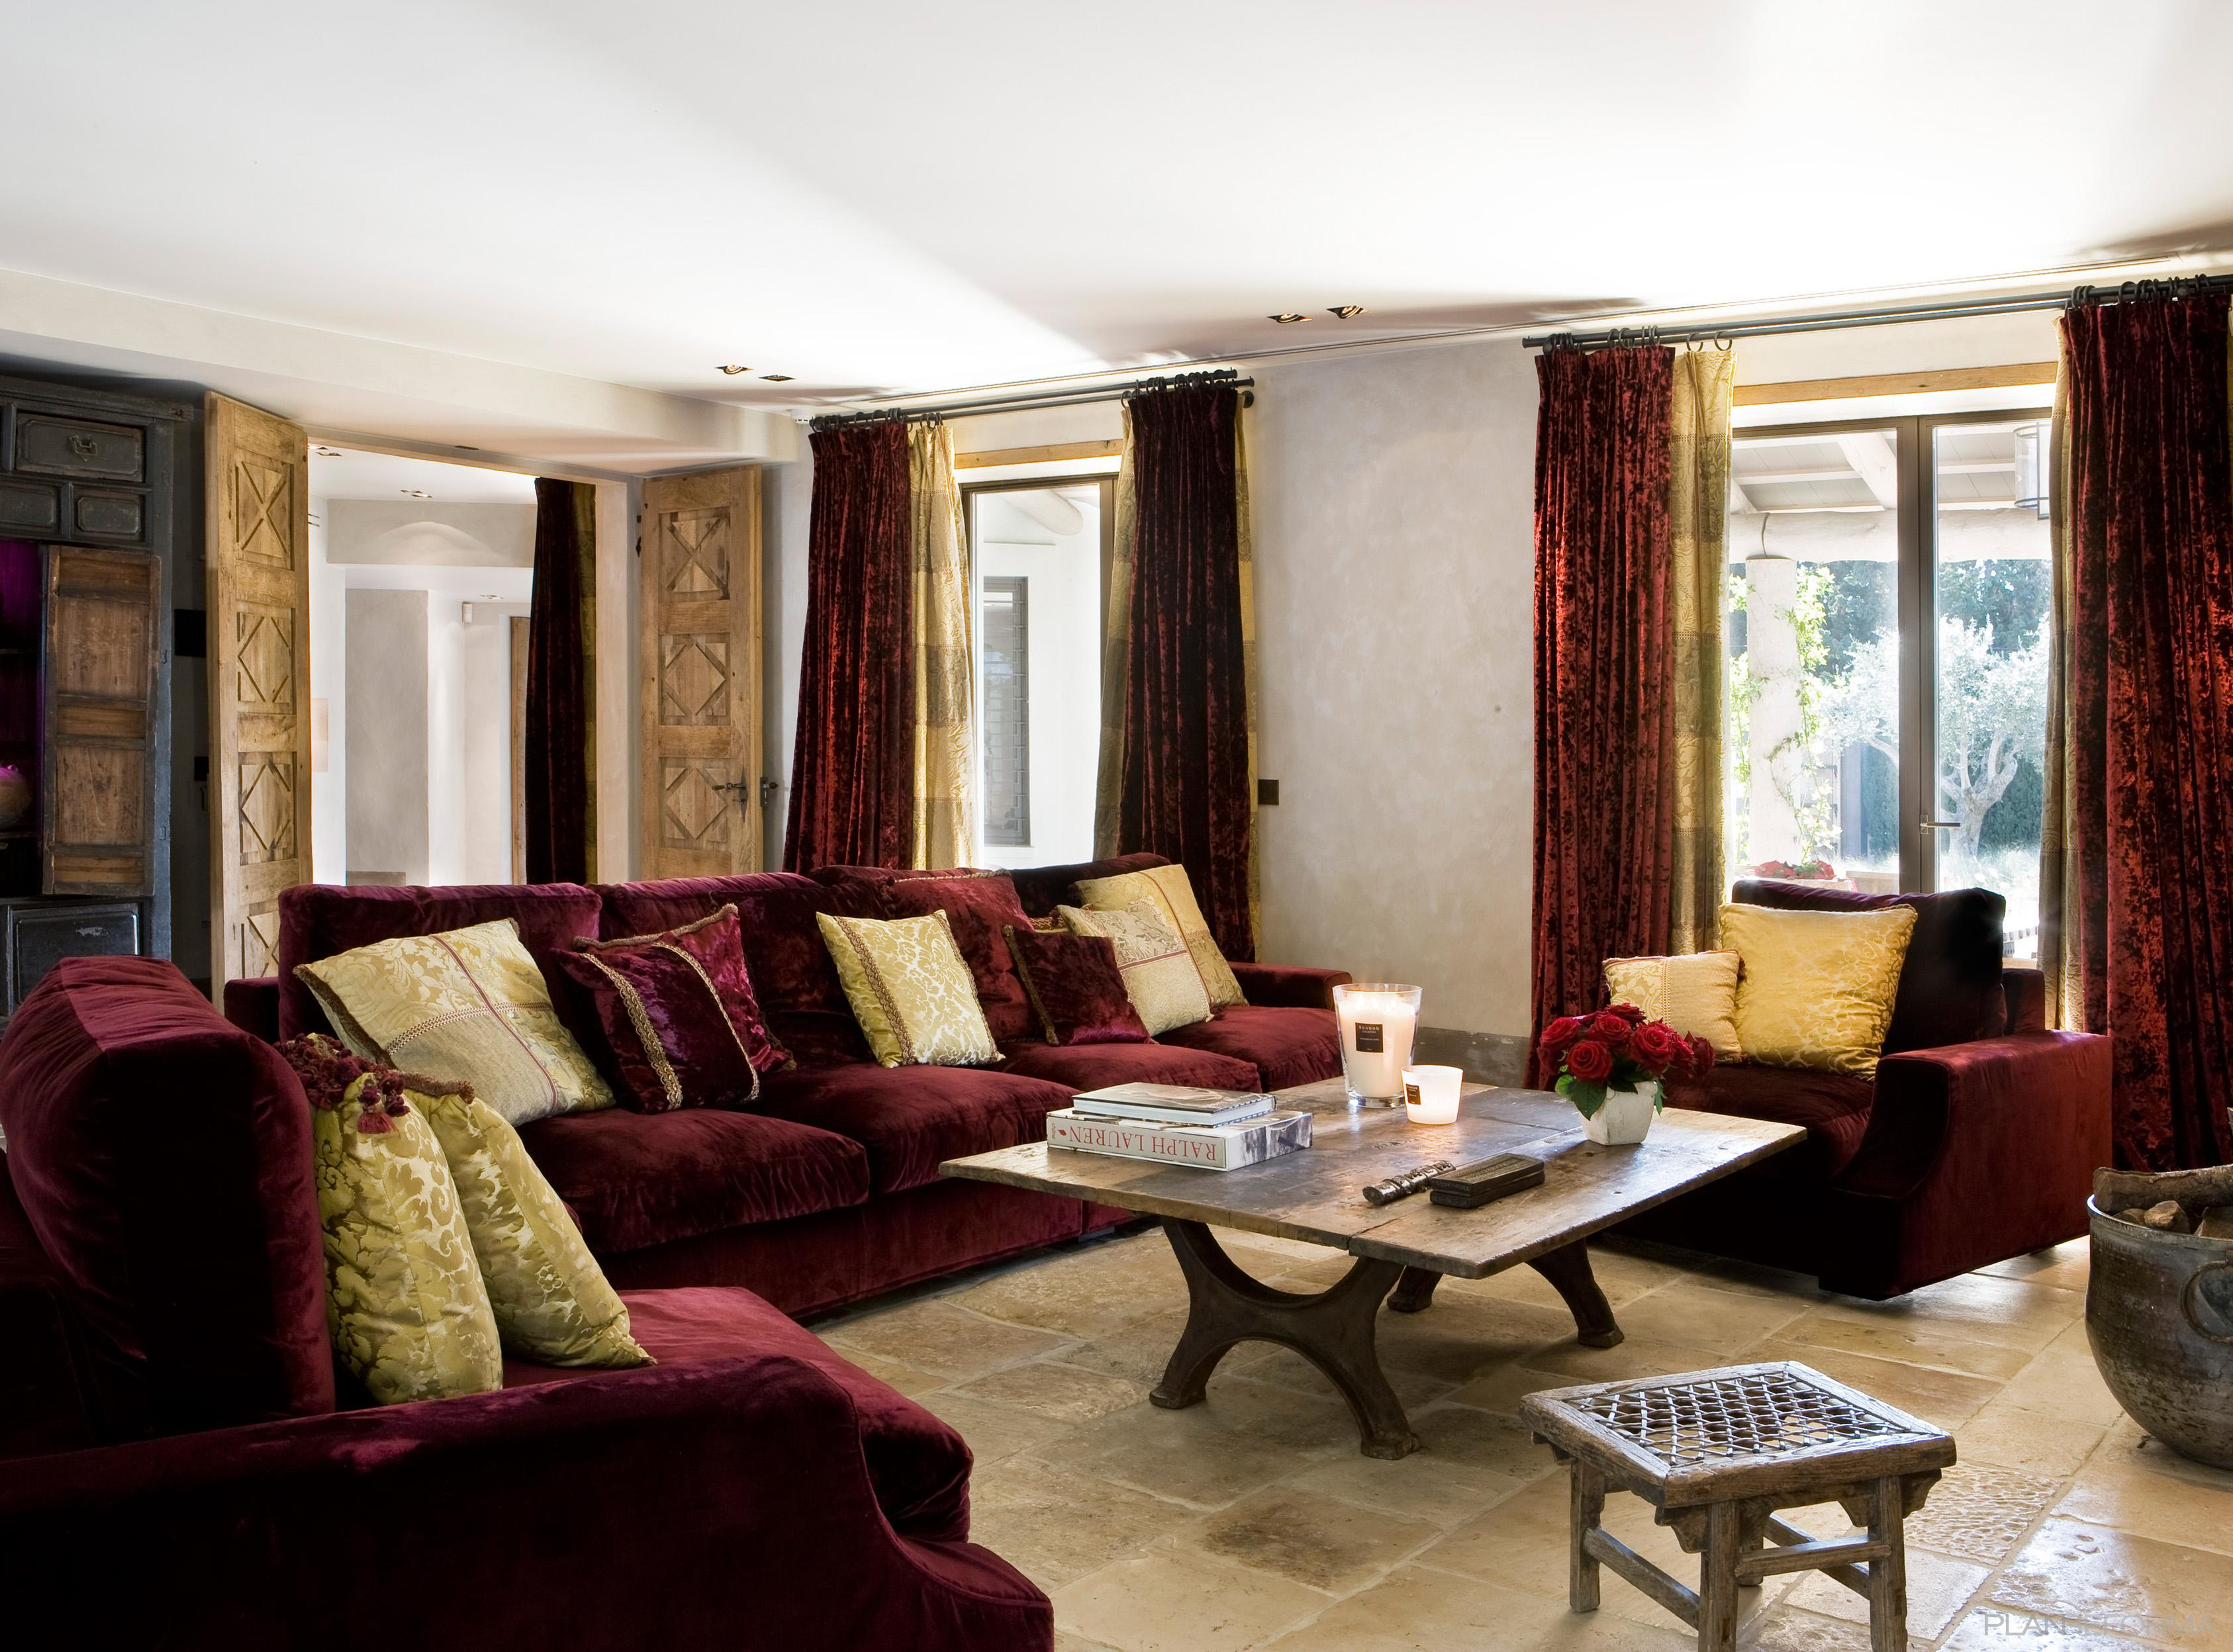 Salon Estilo clasico Color rojo, gris, bronce  diseñado por JUAN RAMÓN ARTIGAS PEINADO   Arquitecto